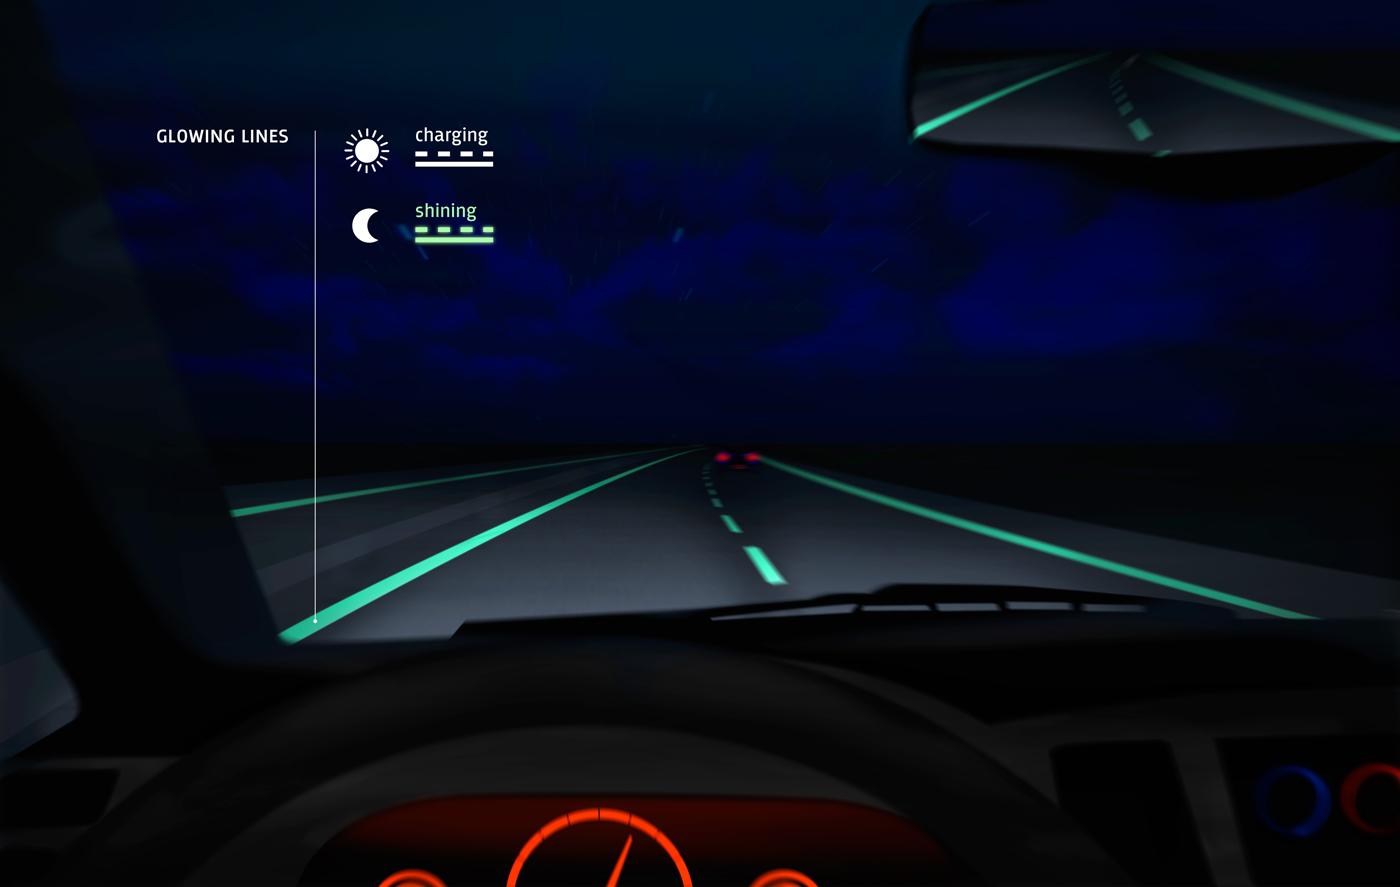 Glowing_lines_of_smart_highway